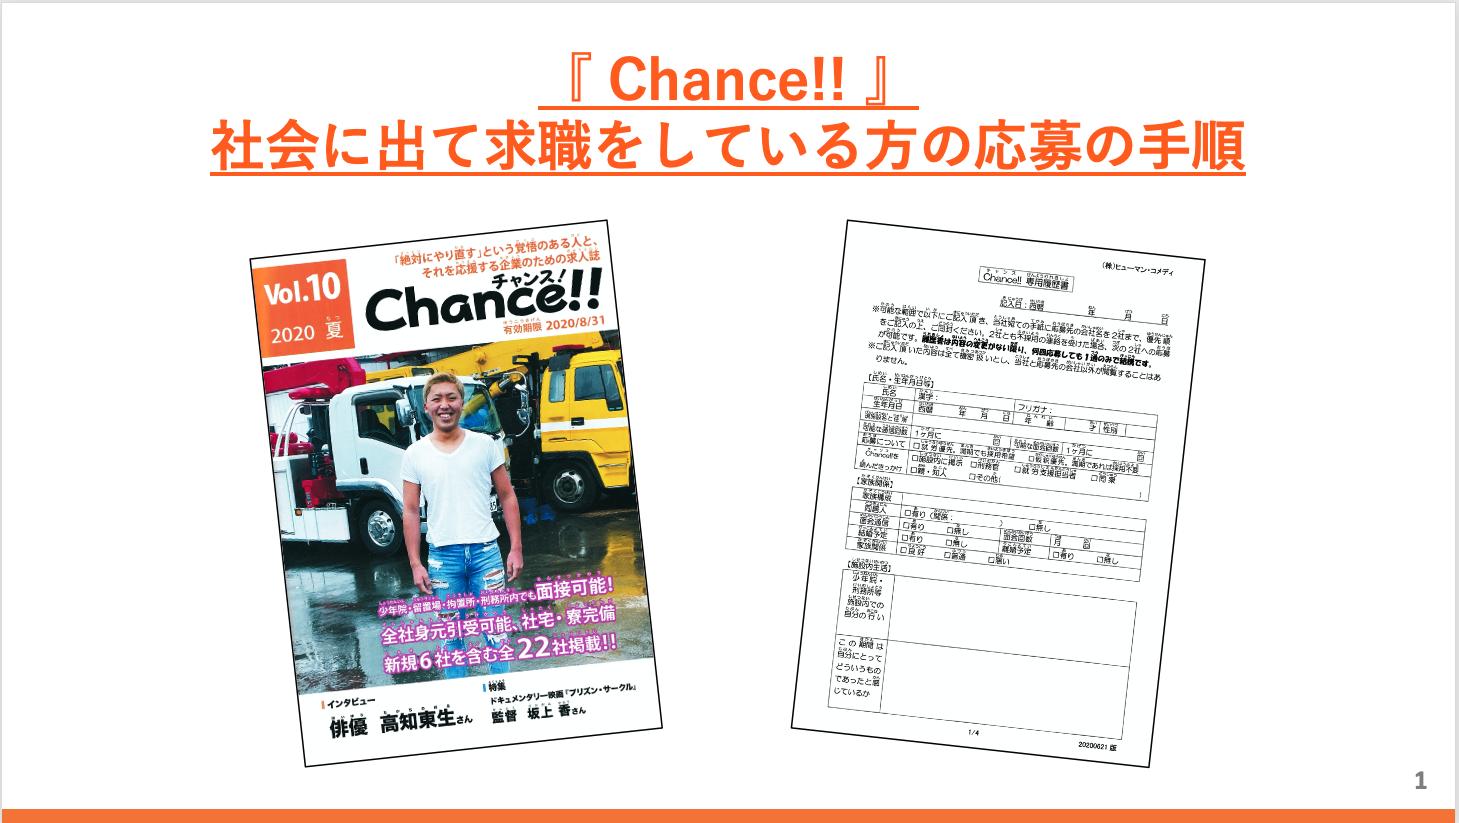 『Chance!!』応募イメージ